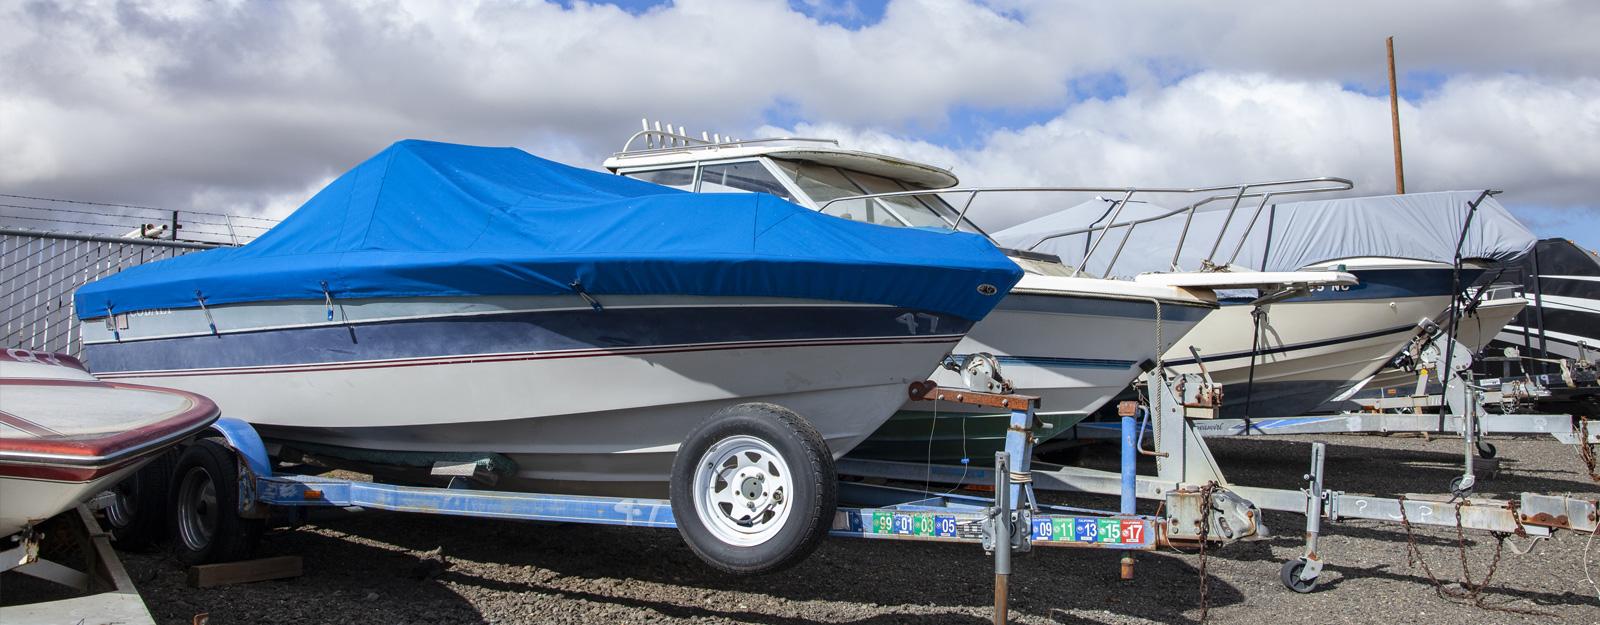 boat parking in north highlands, ca